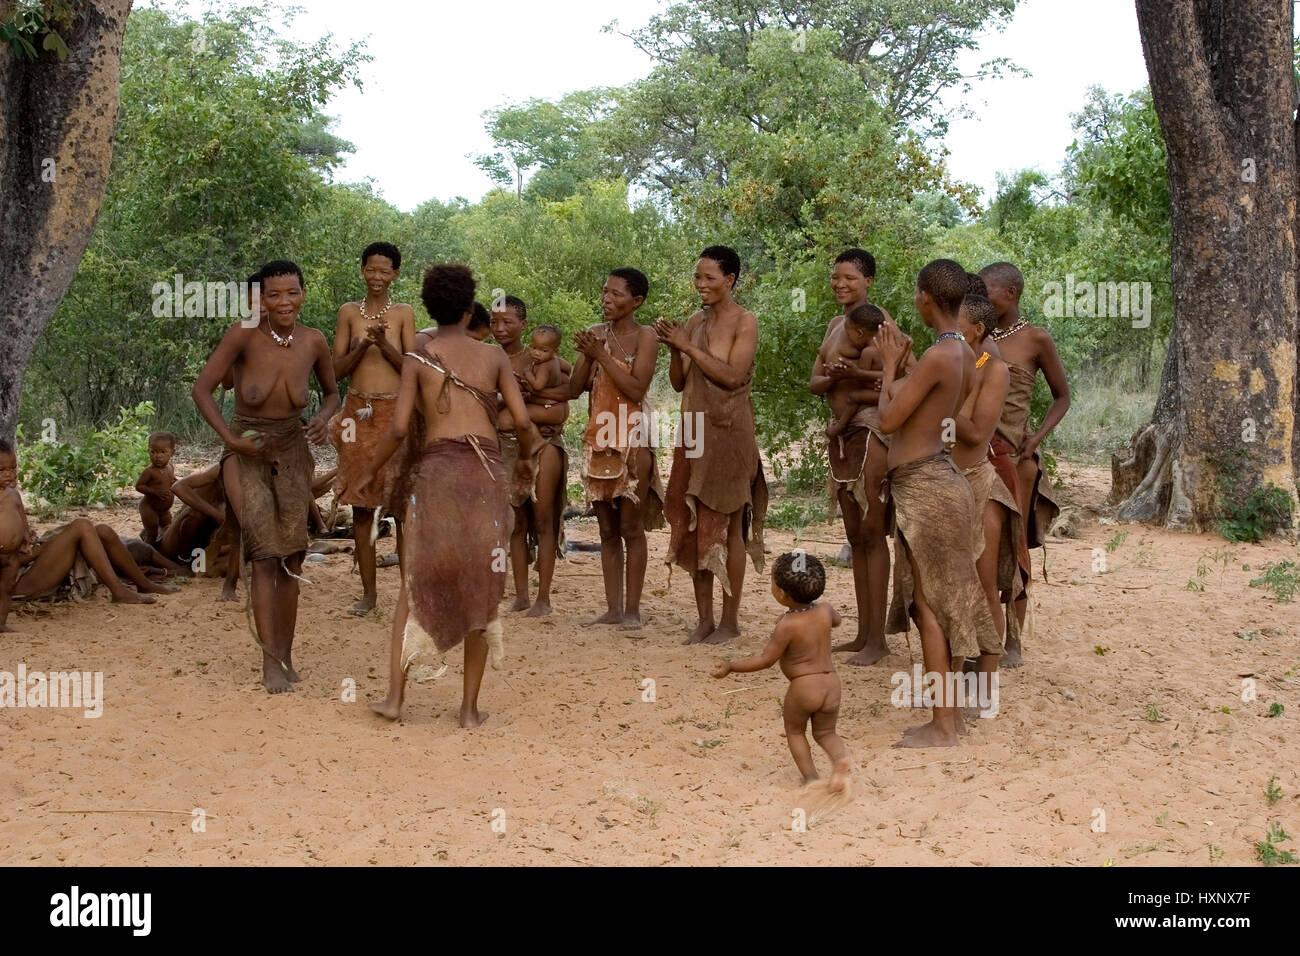 Bushman Fraue dance. Namibia, Buschmann Fraue tanzen. Namibia - Stock Image